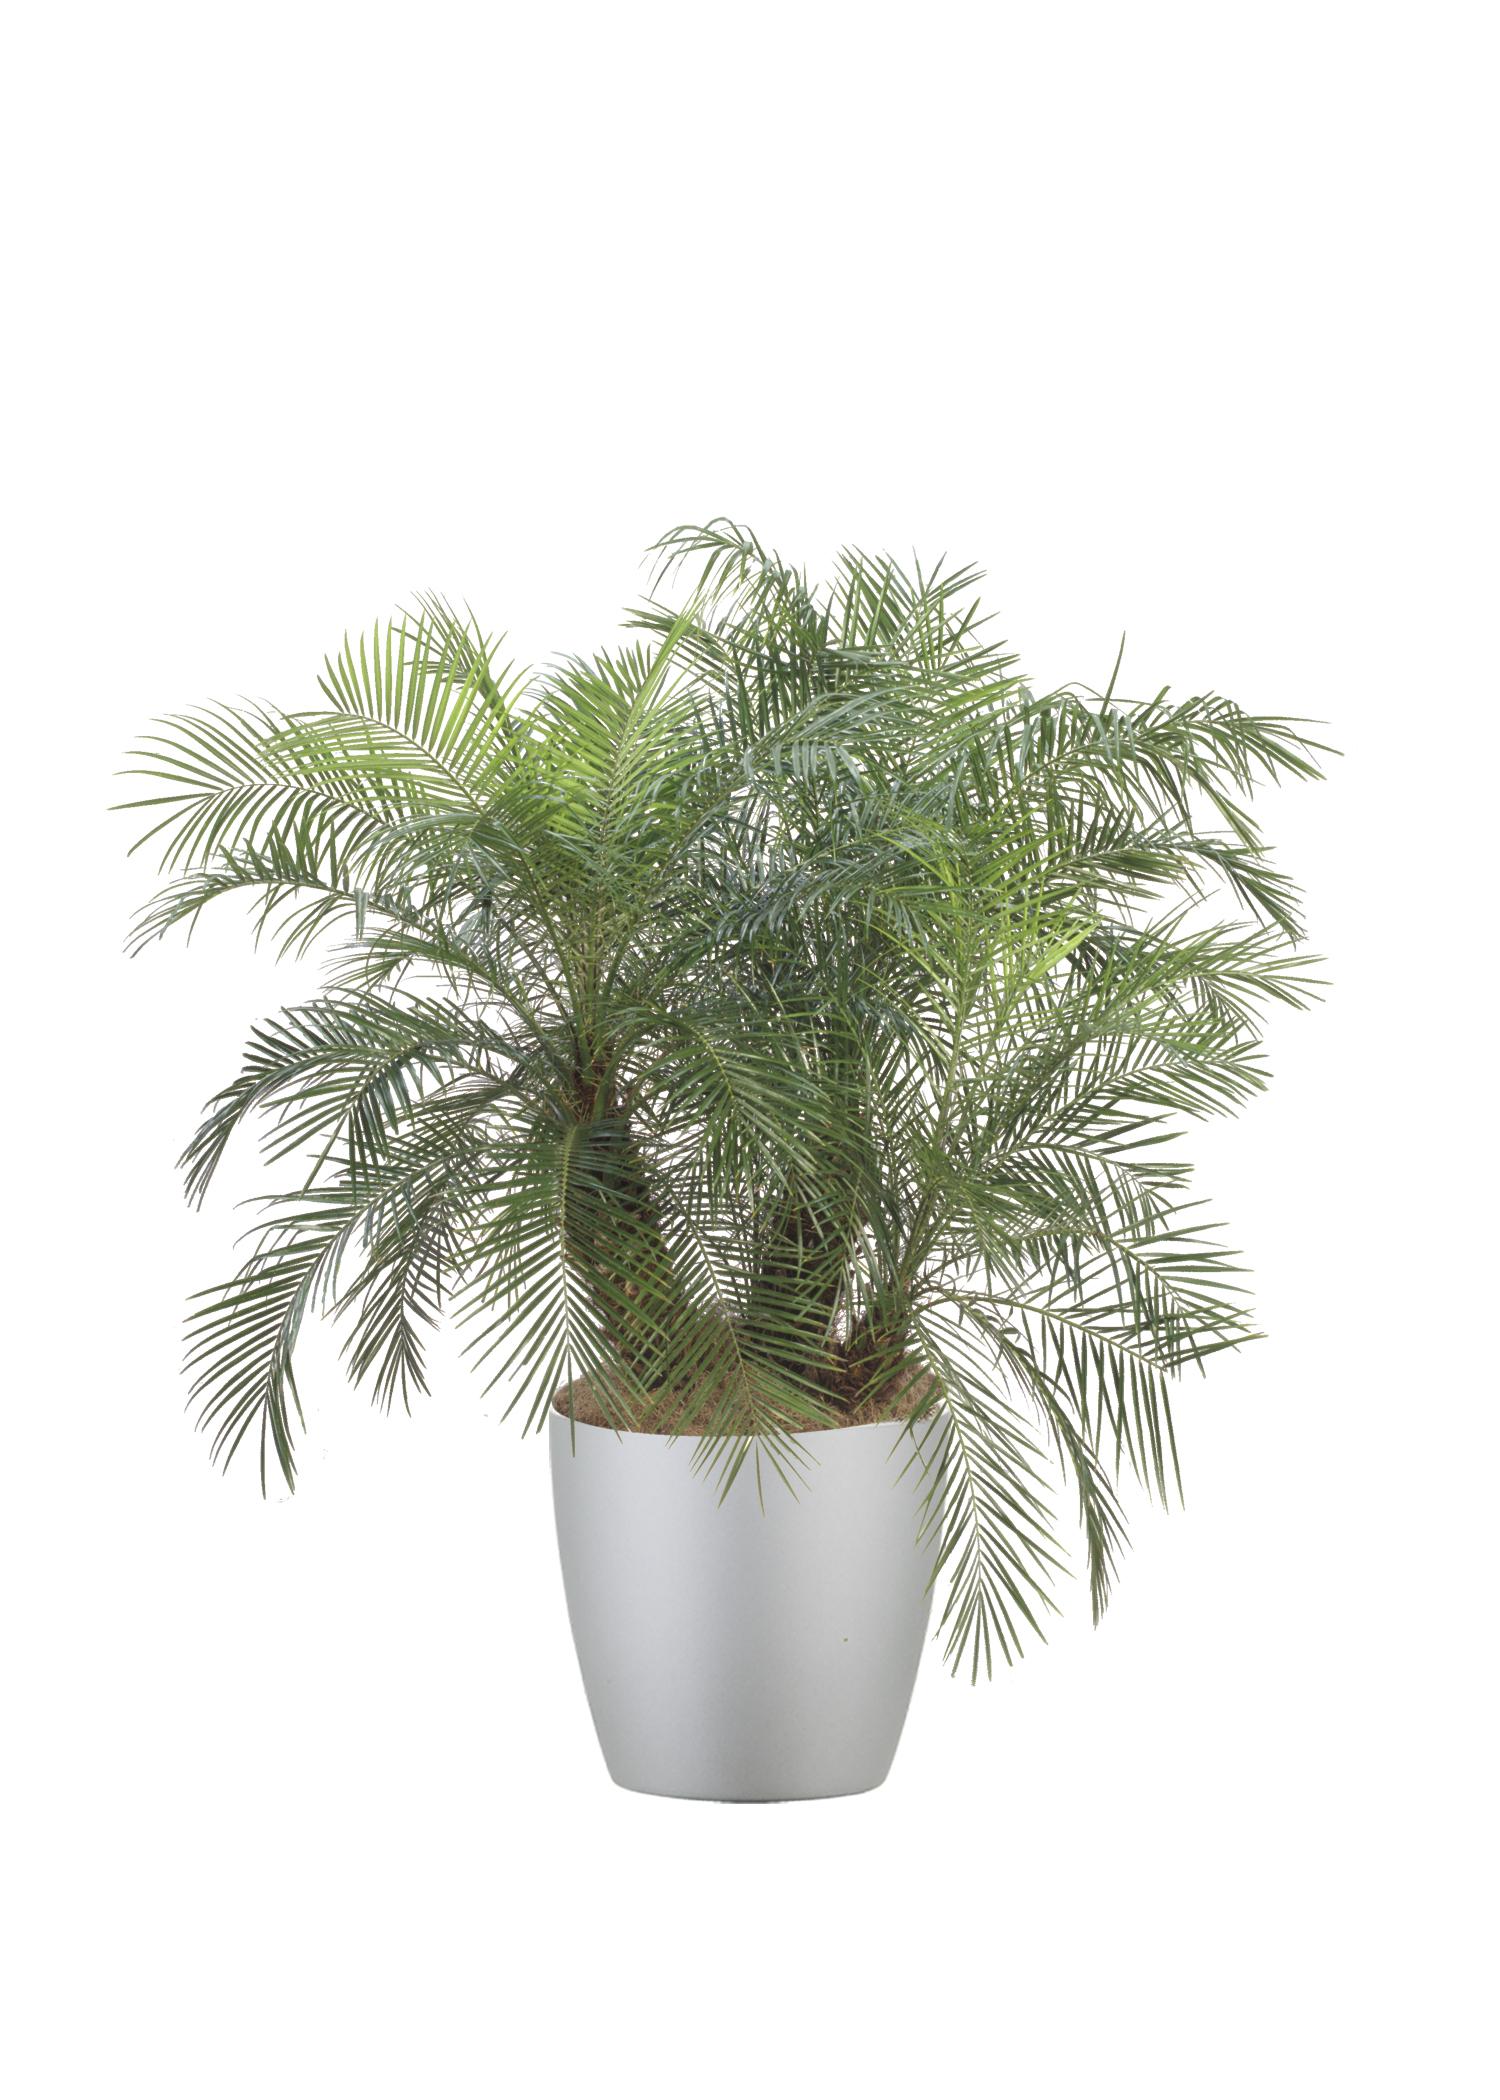 Palm Phoenix Roebellinii